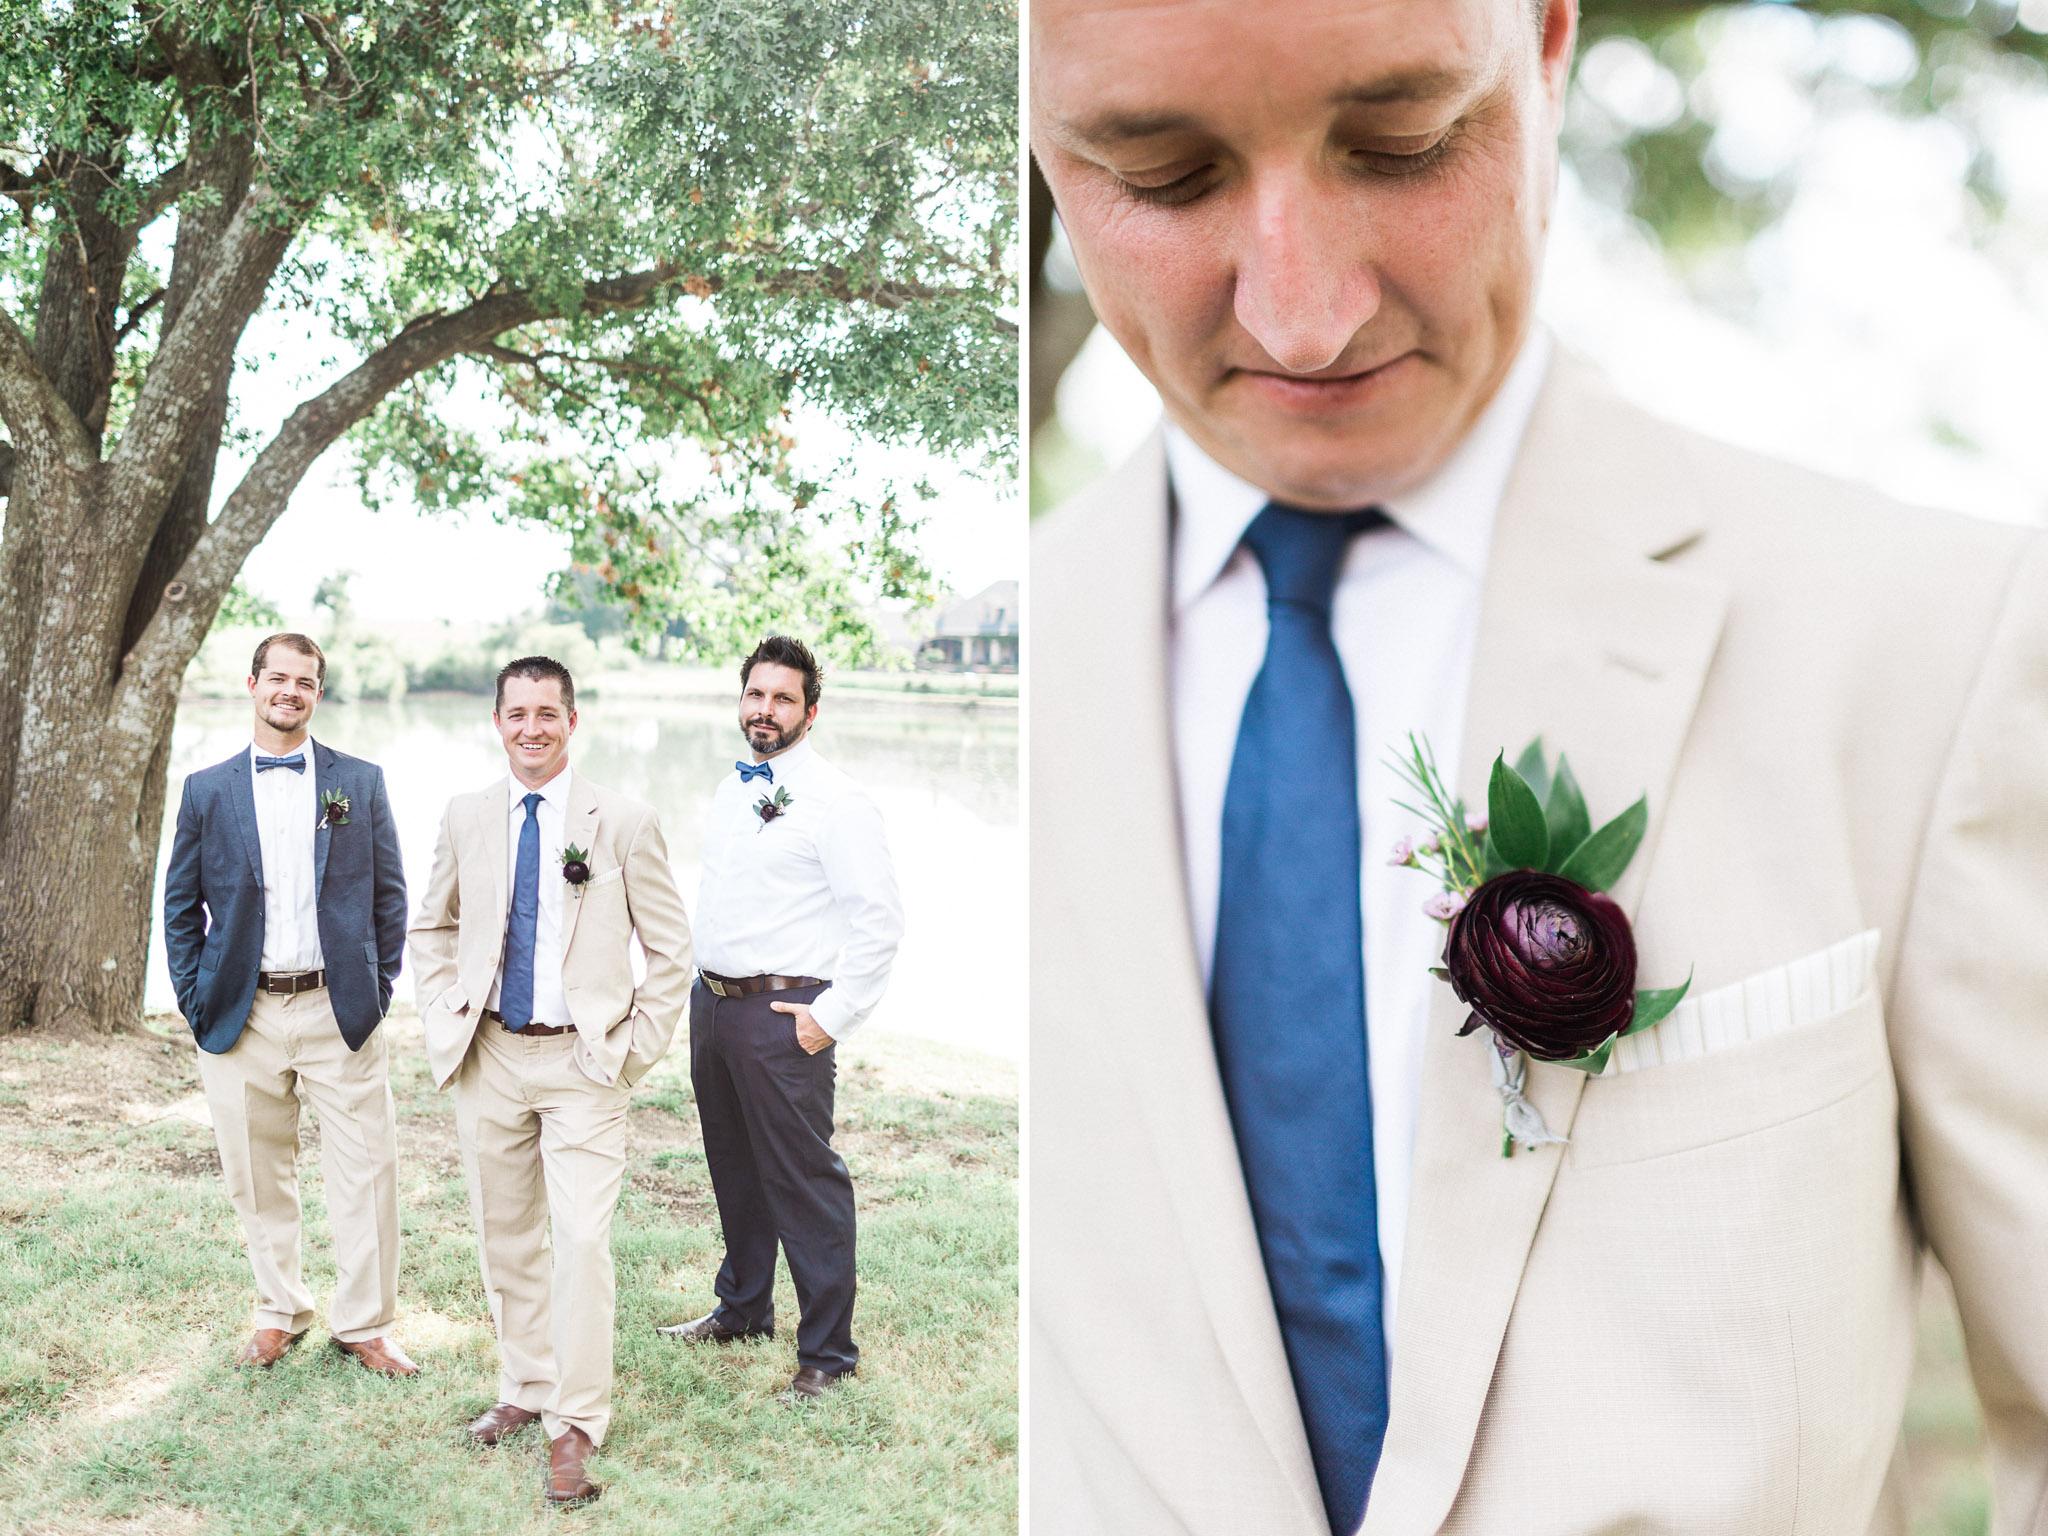 TheBigFakeWedding_DFW_wedding_photographer-104.jpg